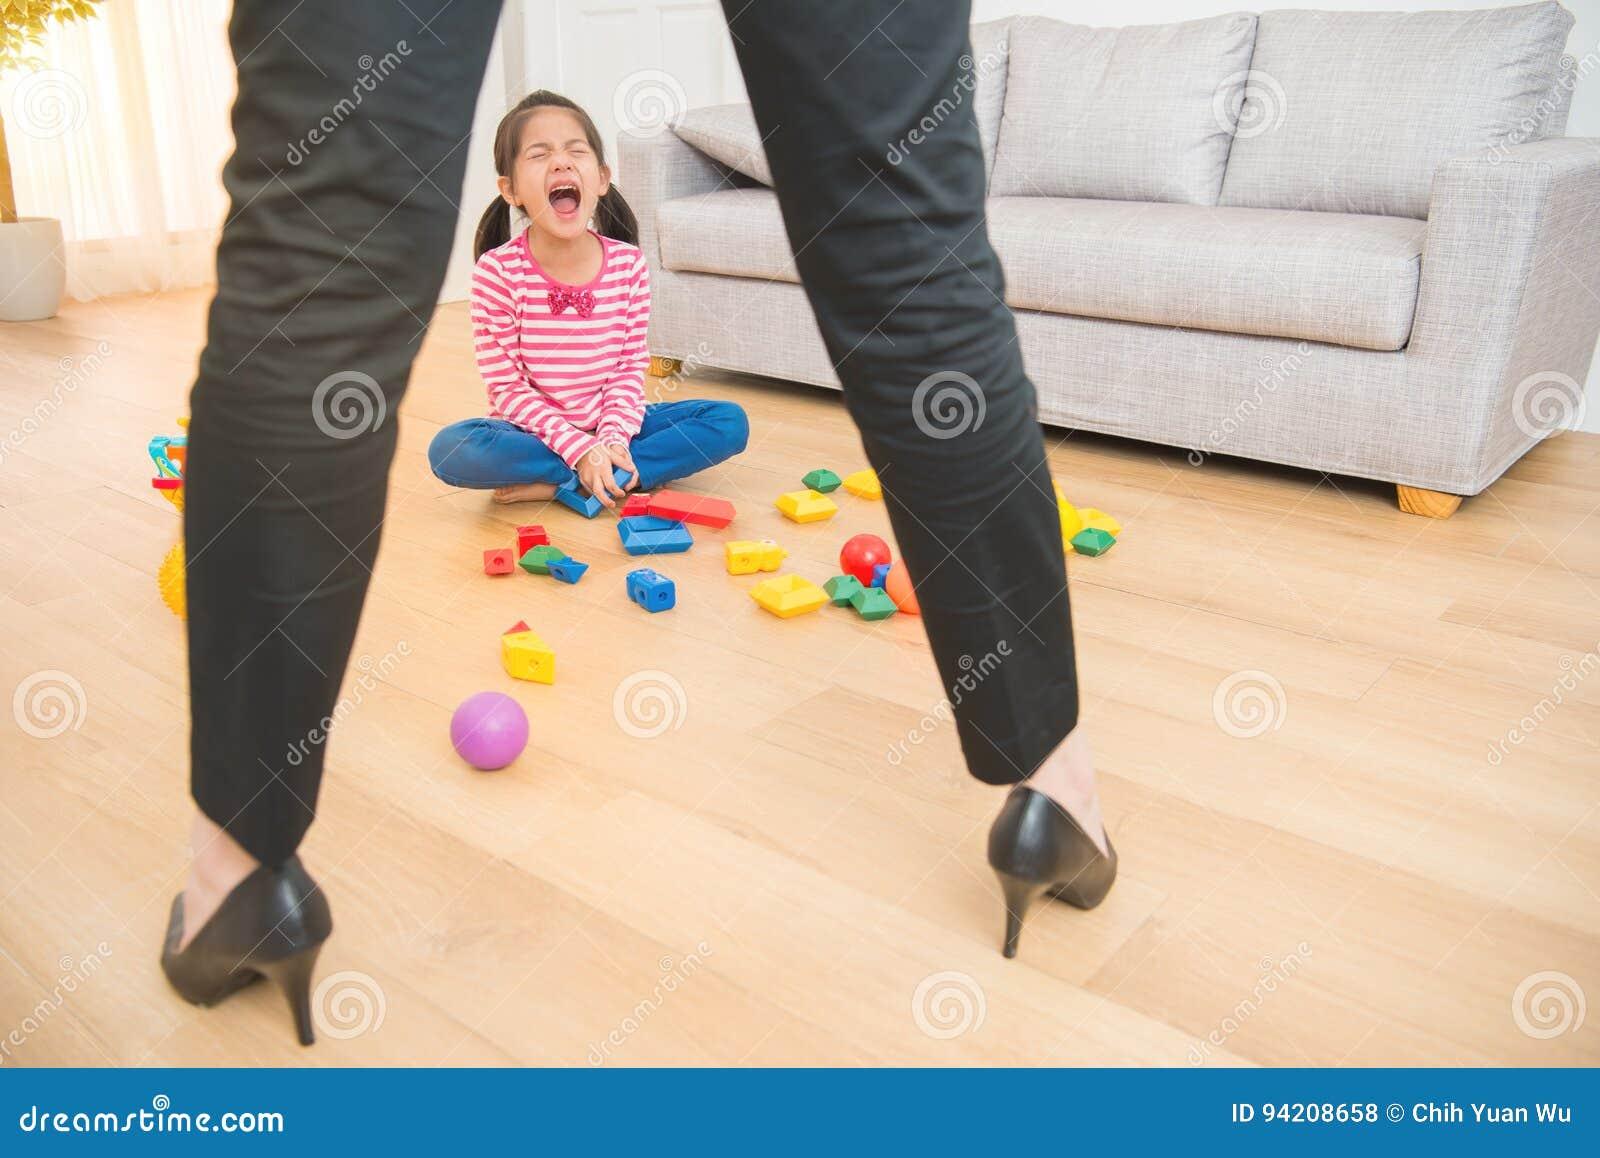 Girl Busy With Toys Stock Photography | CartoonDealer.com ...